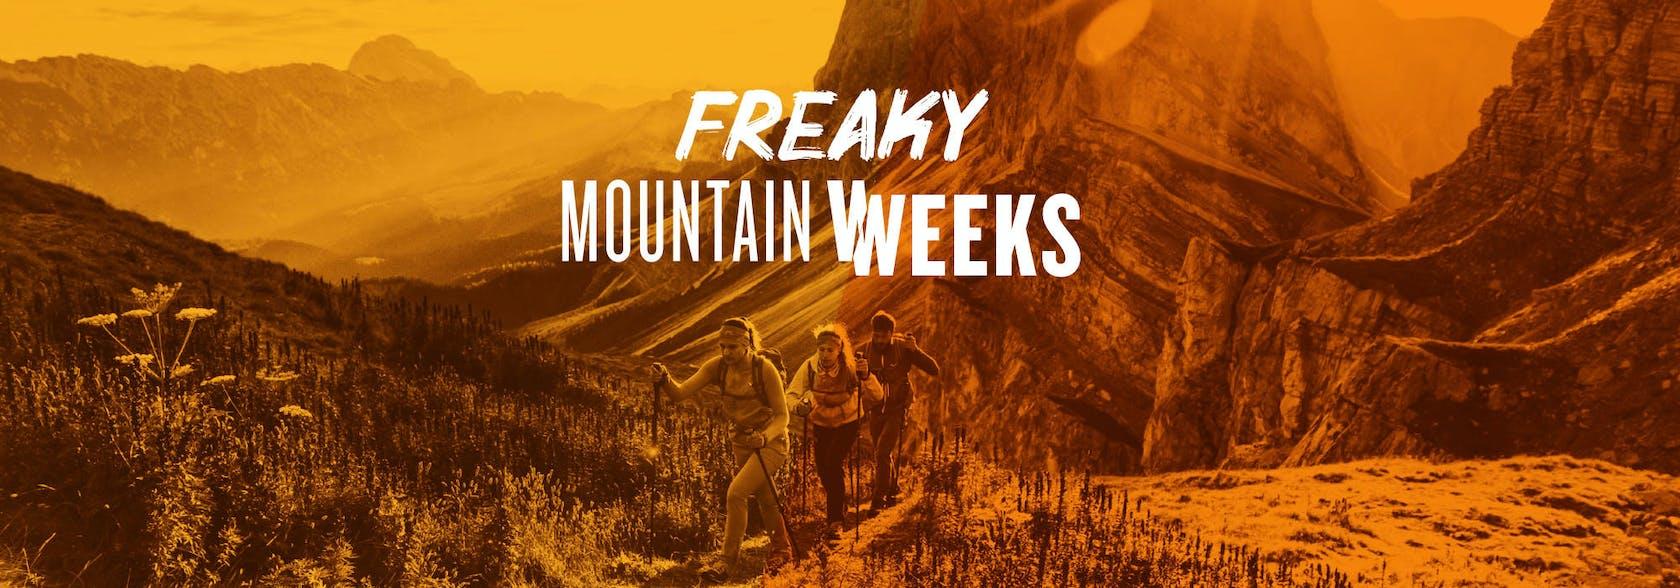 Freaky Mountain Weeks SORTLER